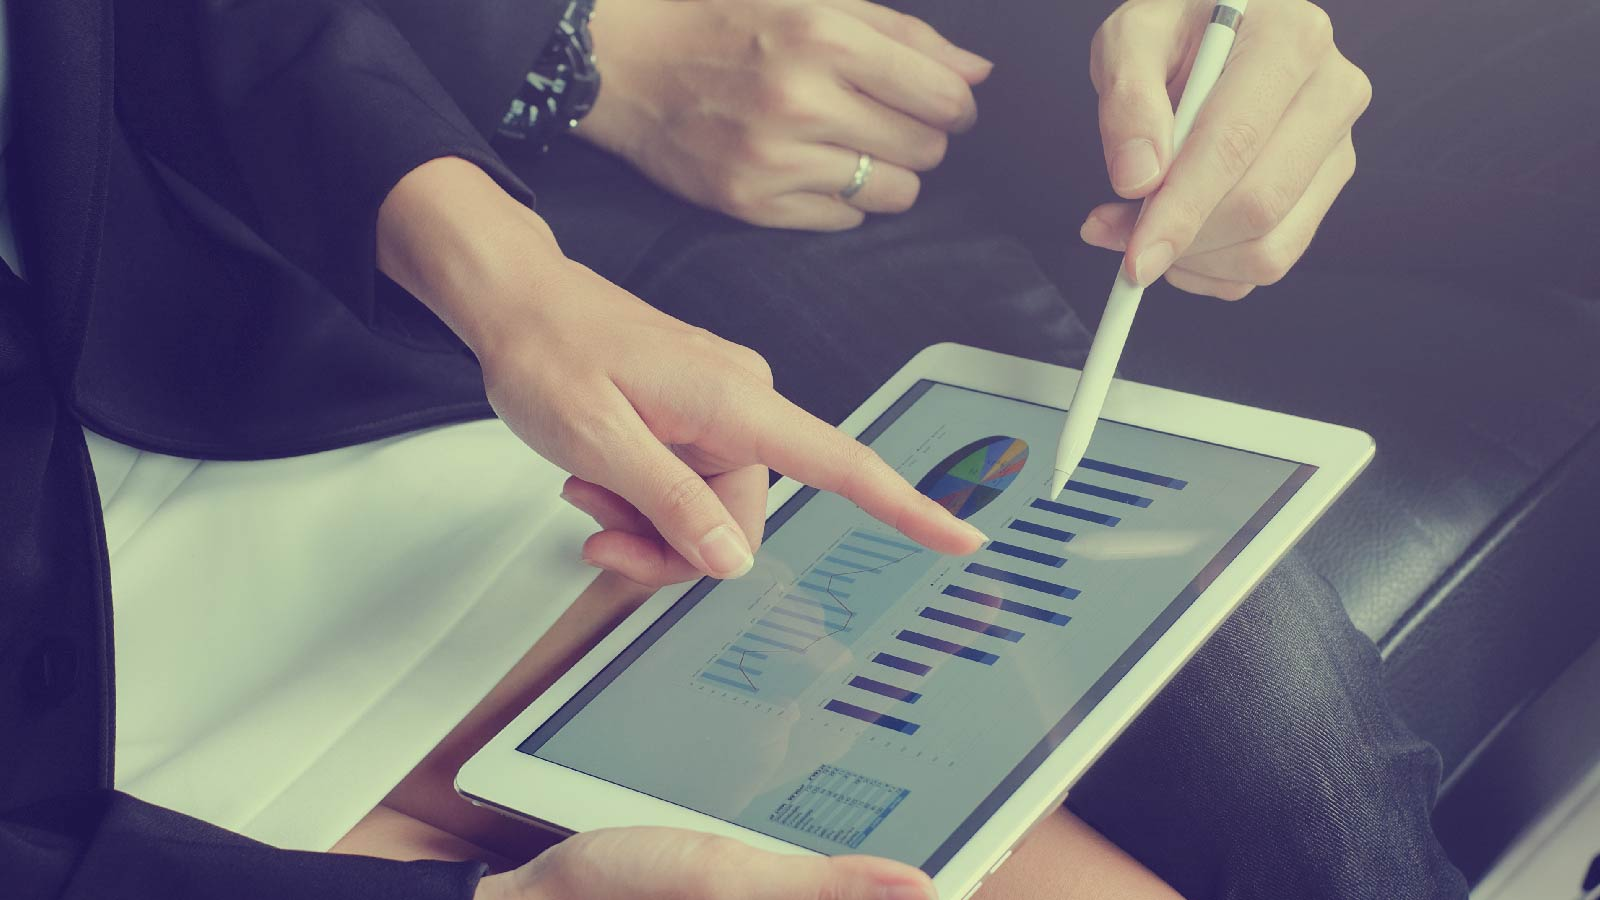 Increased Digital Experiences Accelerates Bad Data